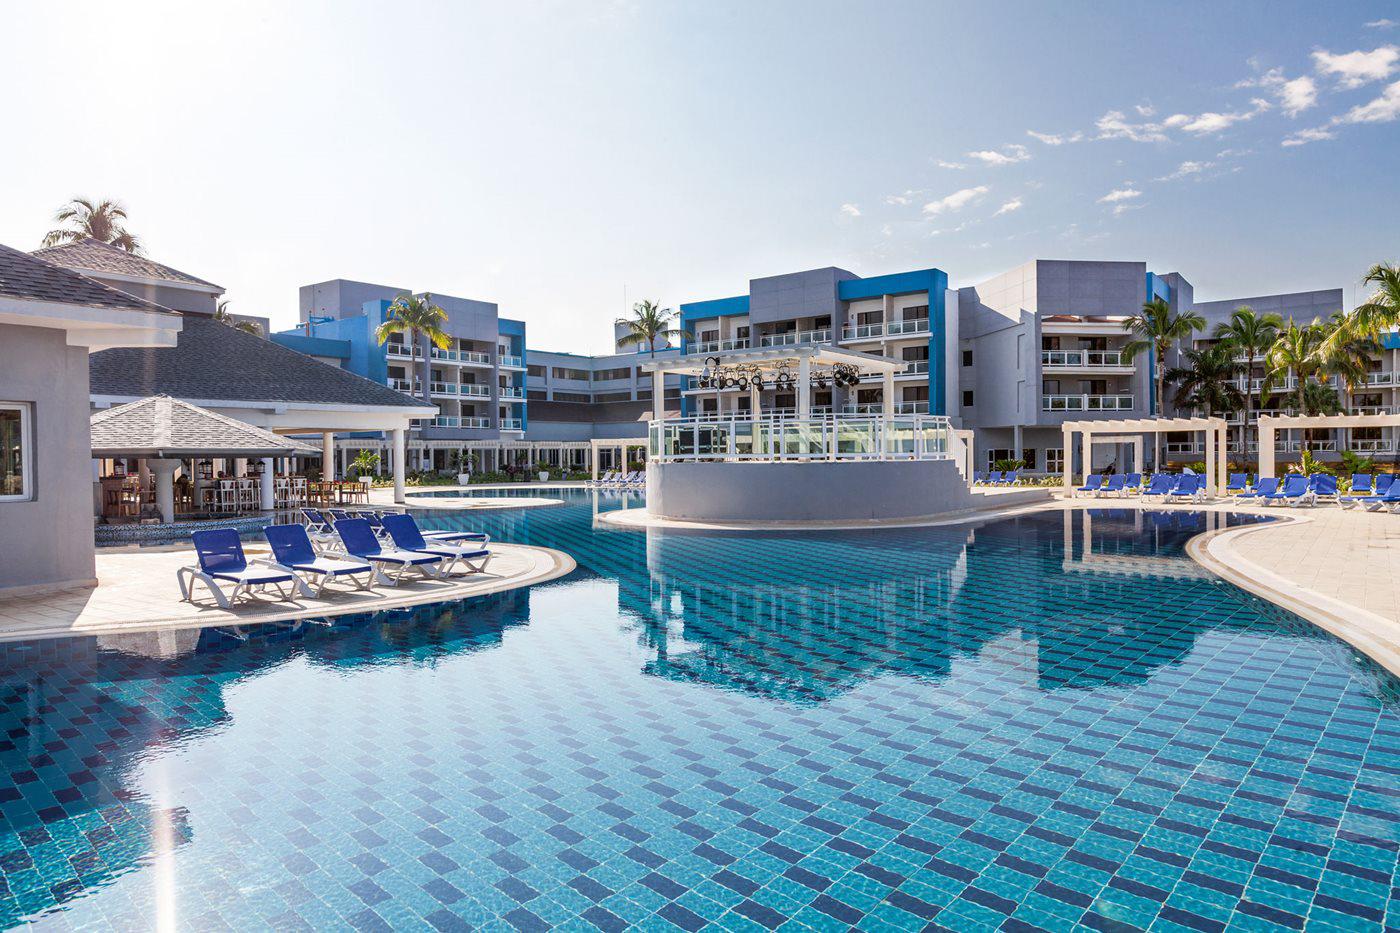 VRA-Sol-Varadero-Beach-Pool-001